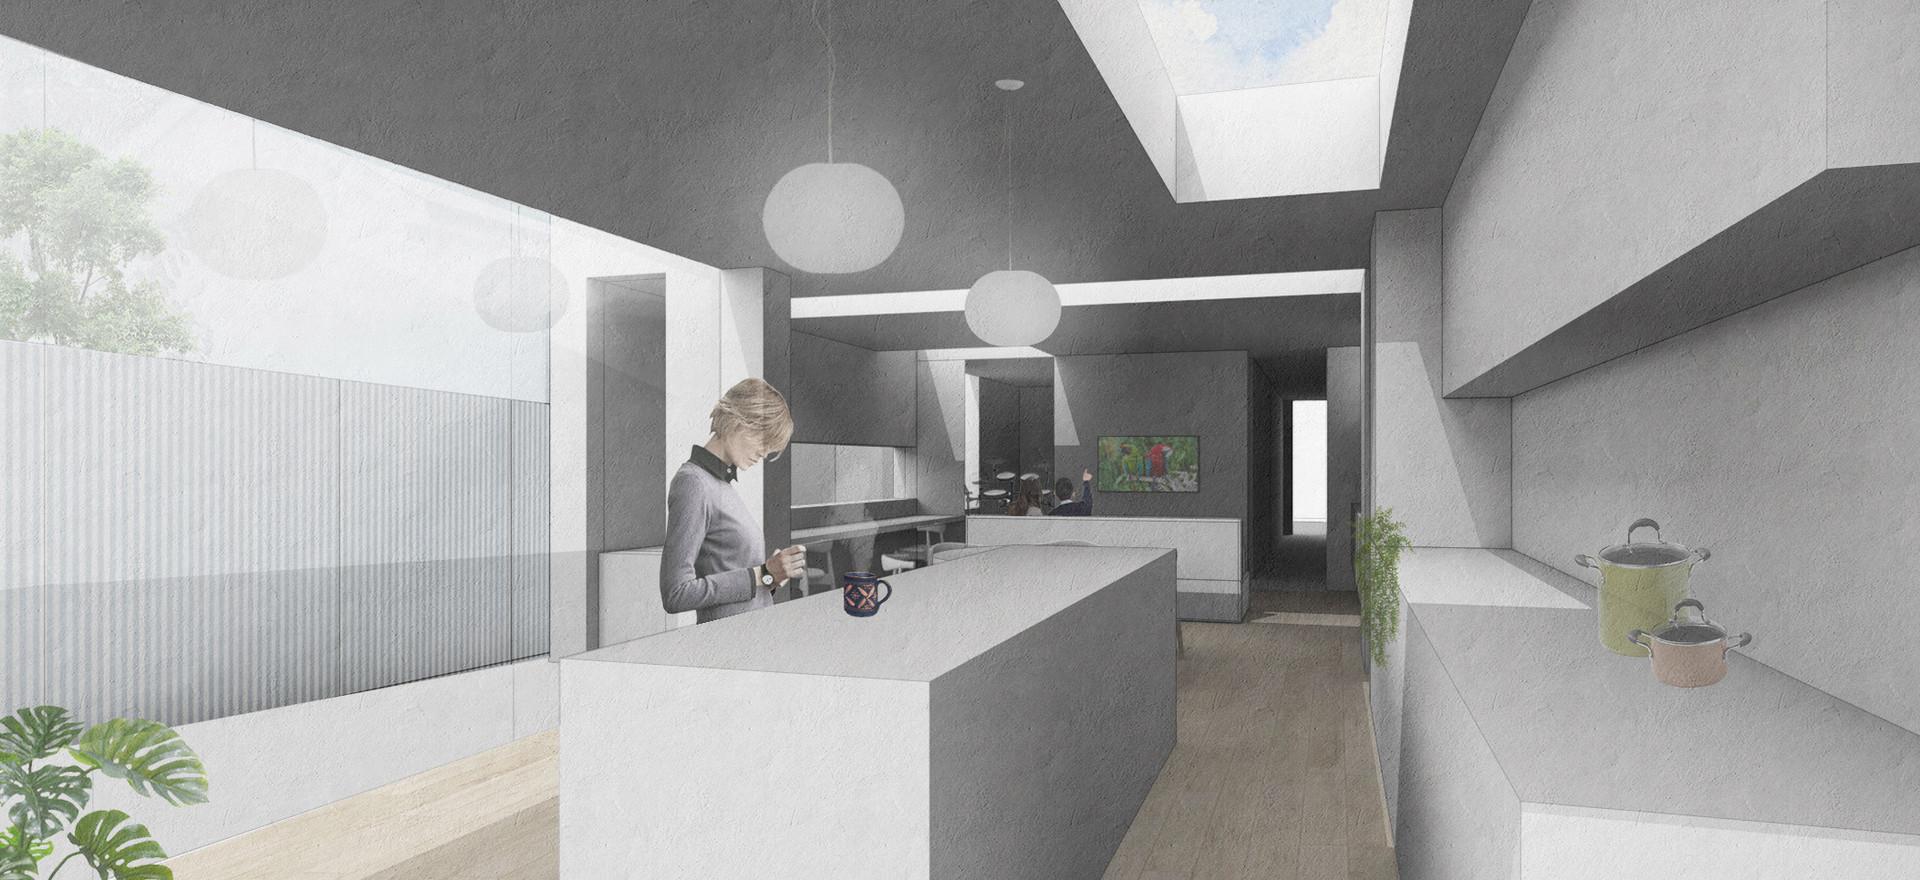 wrap_19KW_kitchen view 01b.jpg